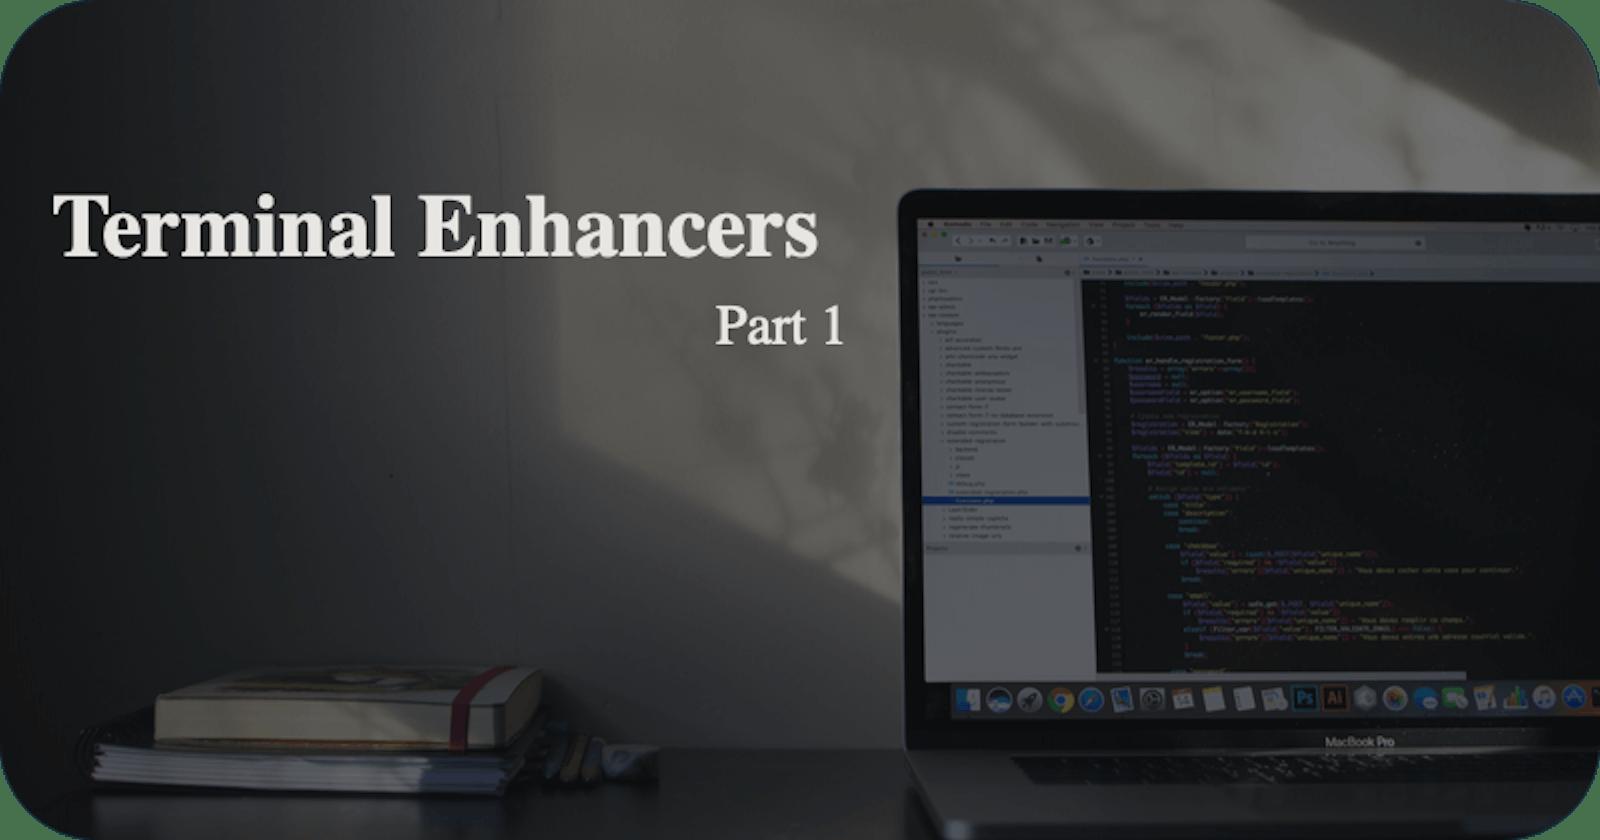 Terminal Enhancers - Part 1